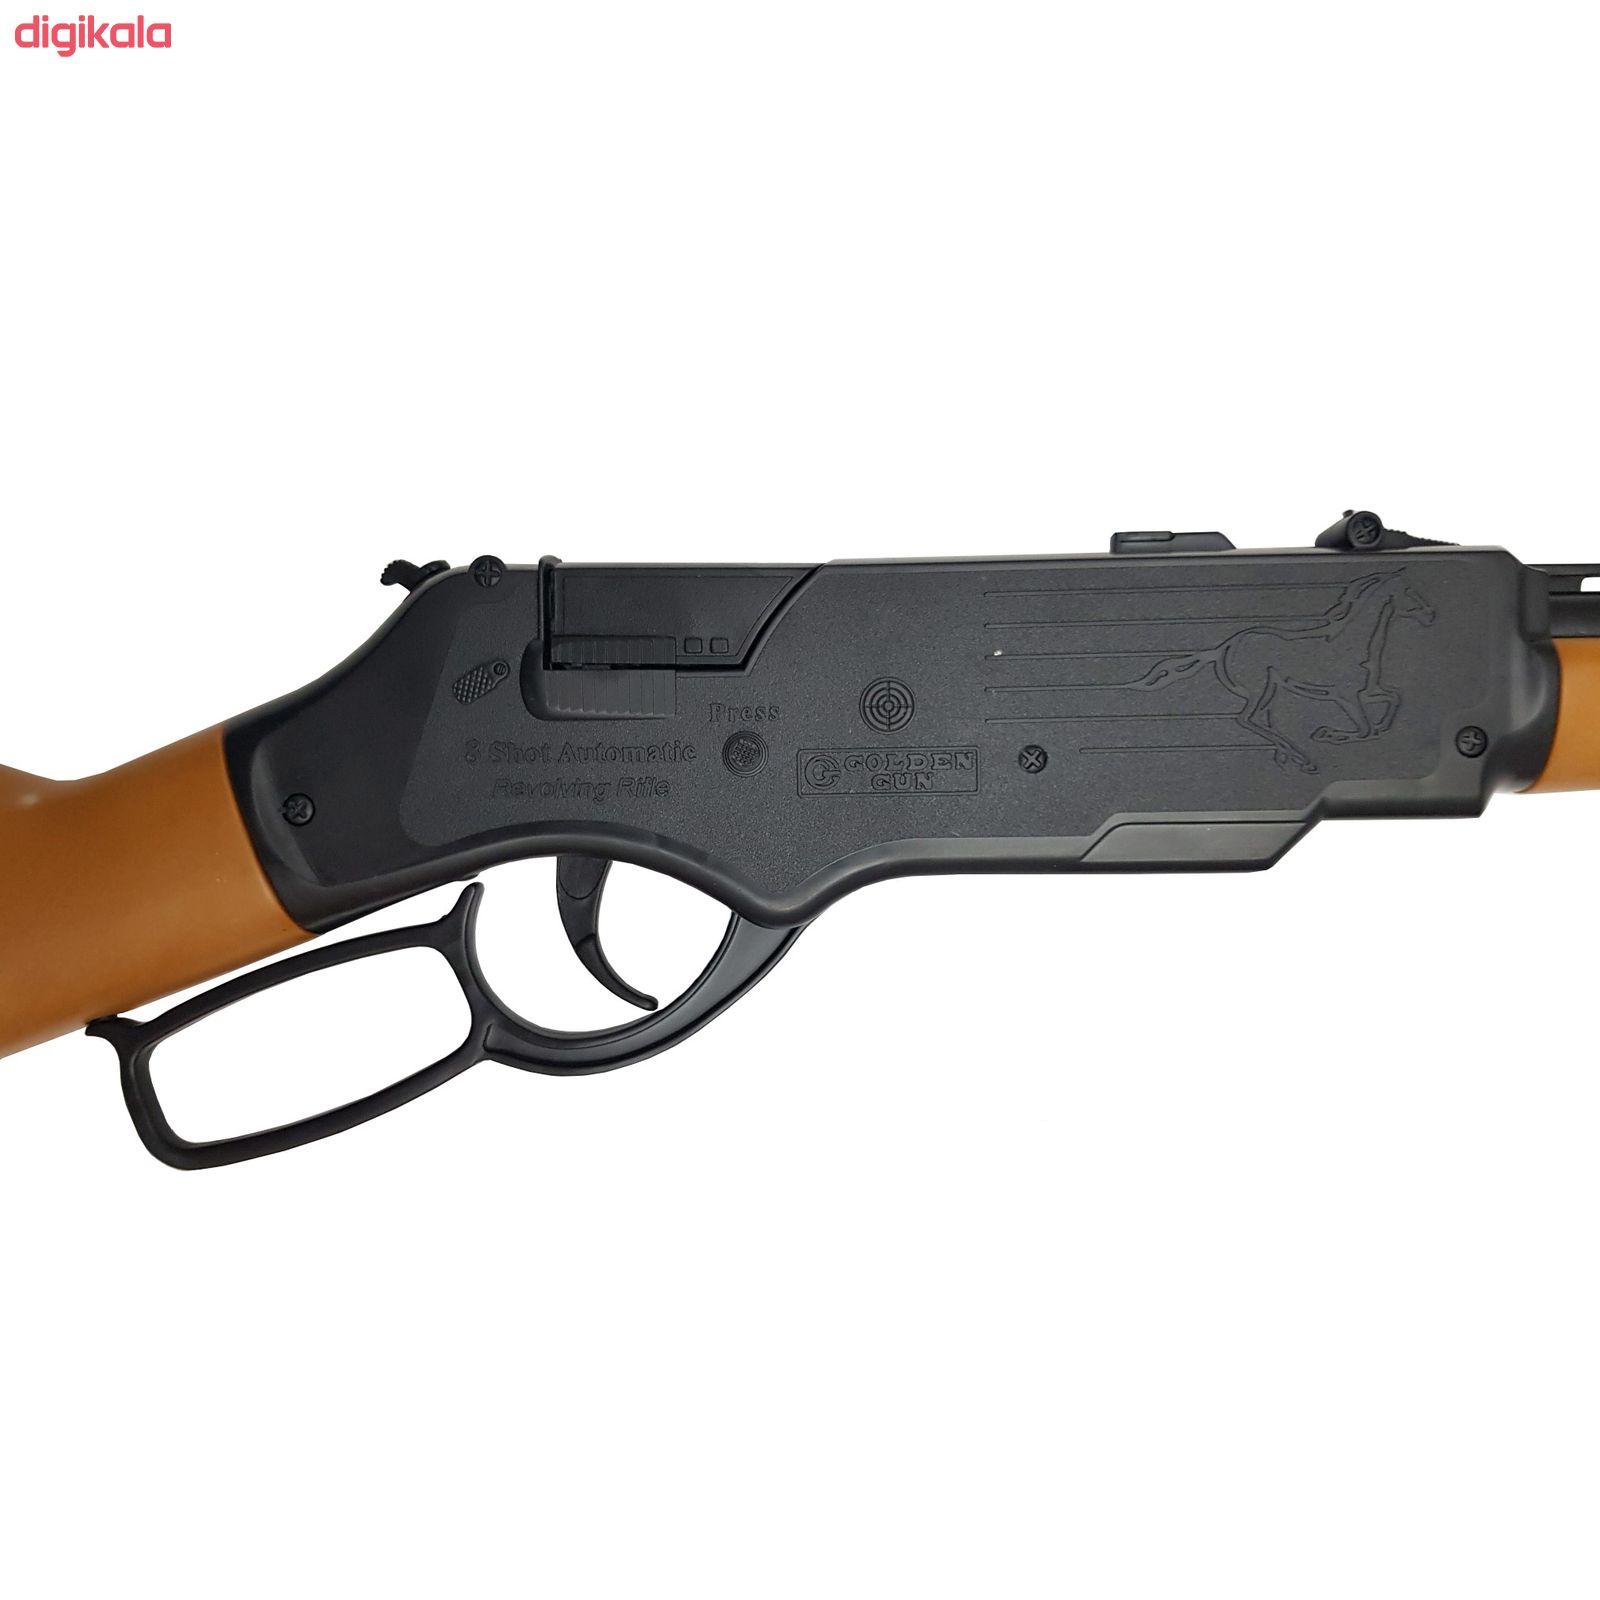 تفنگ بازی گلدن گان مدل naabsell-p100 مجموعه 4 عددی main 1 1